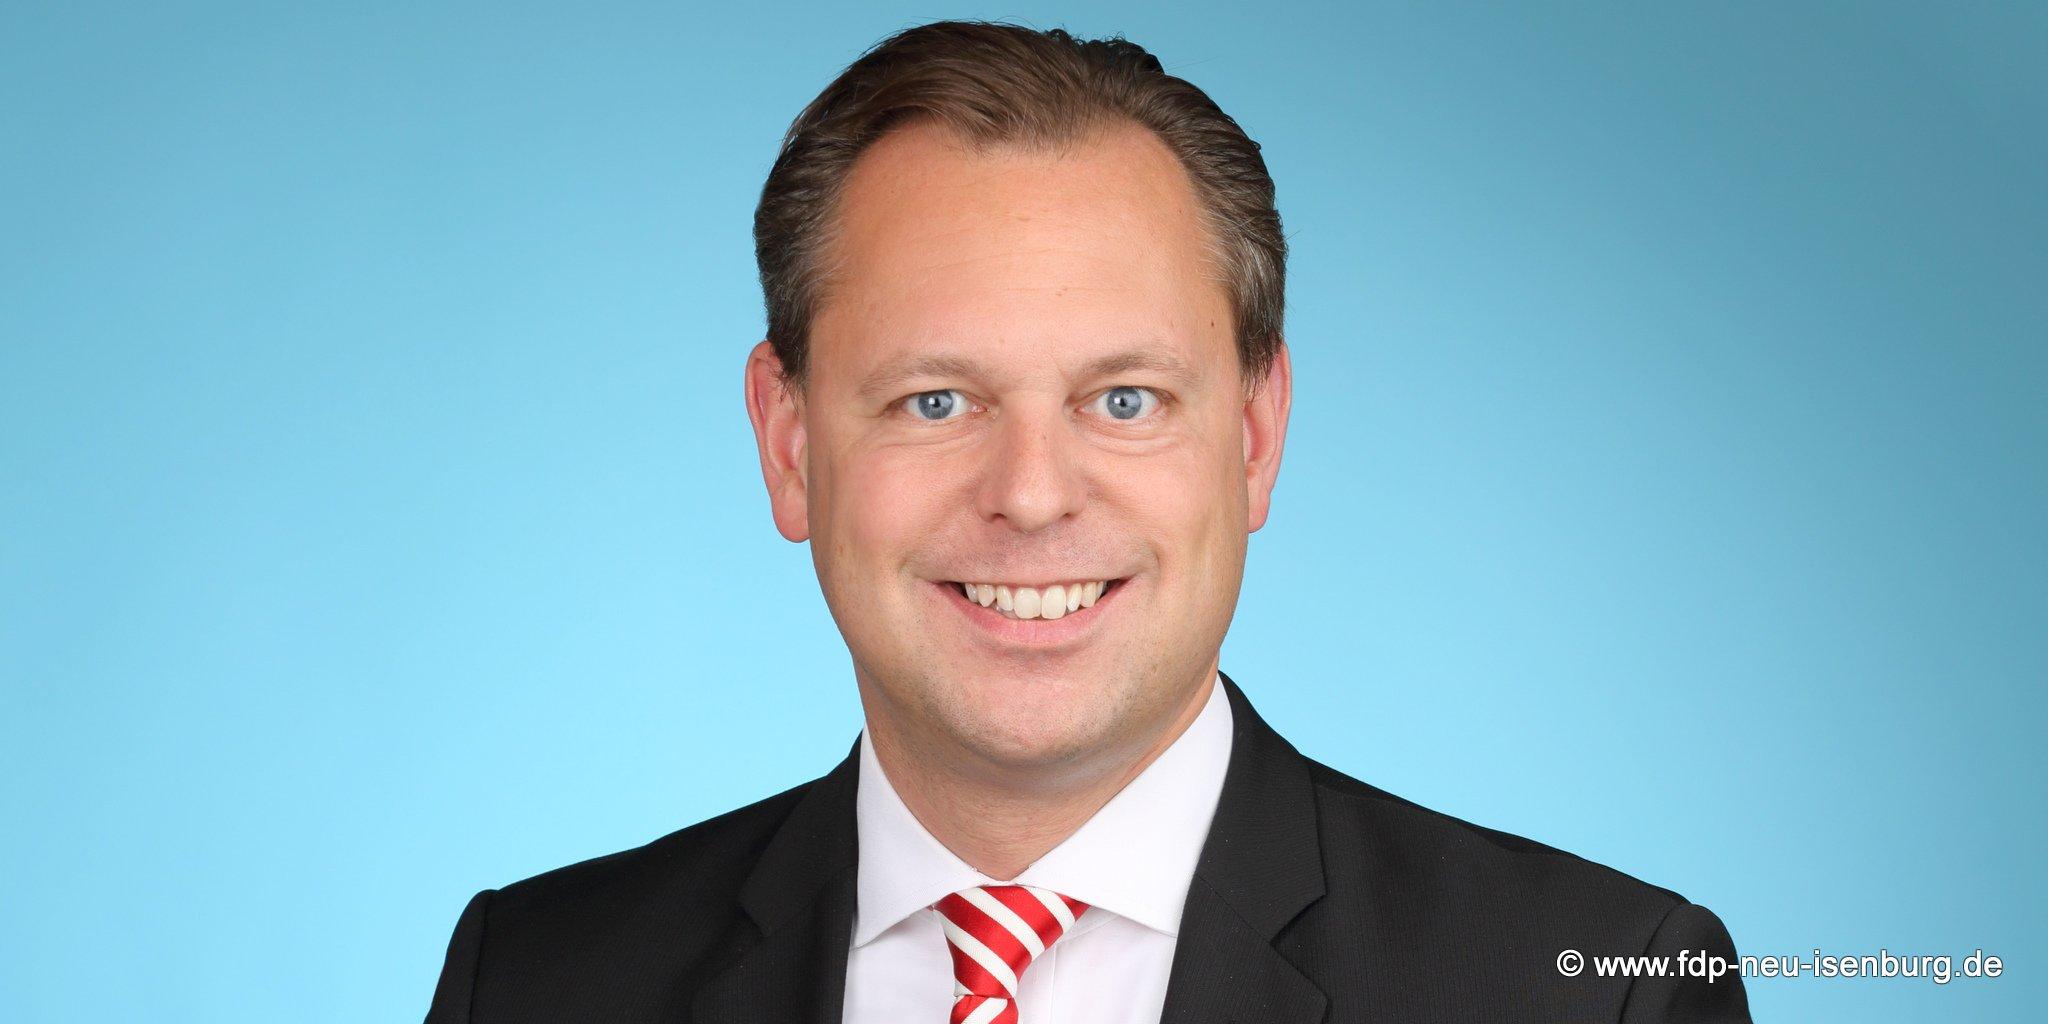 Thilo Seipel, Fraktionsvorsitzender